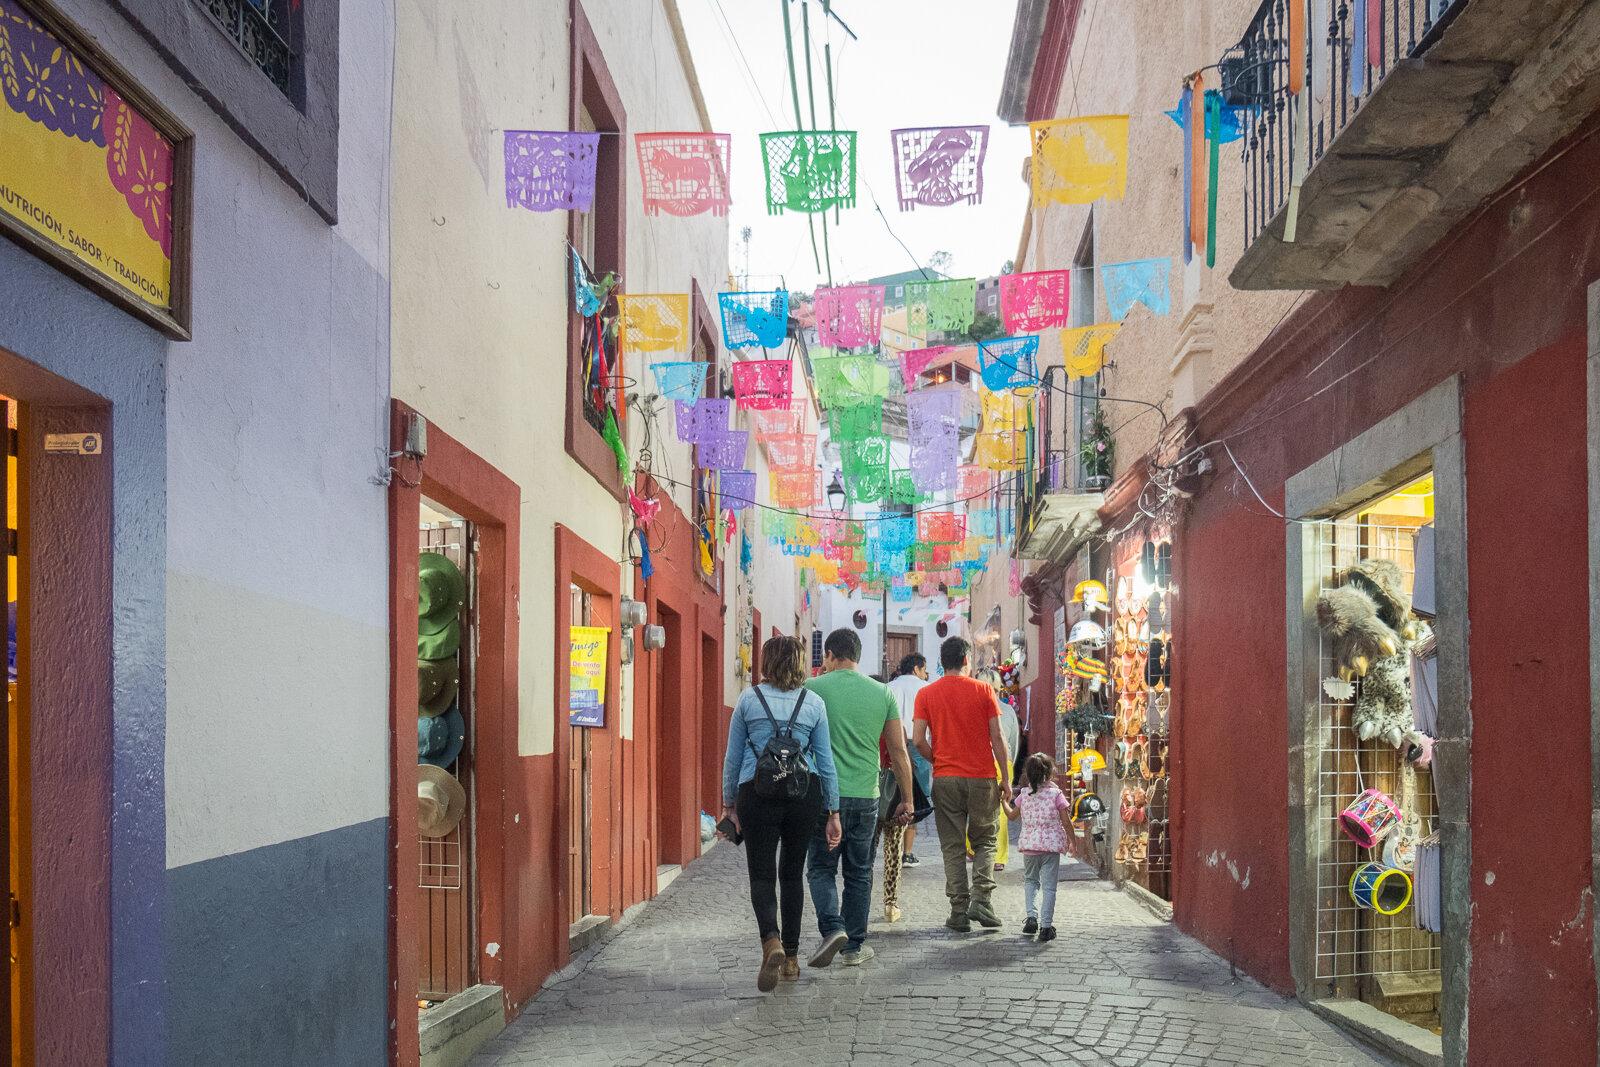 2019.10.8_Mexico_Guanajuato19_Britt first year.jpg